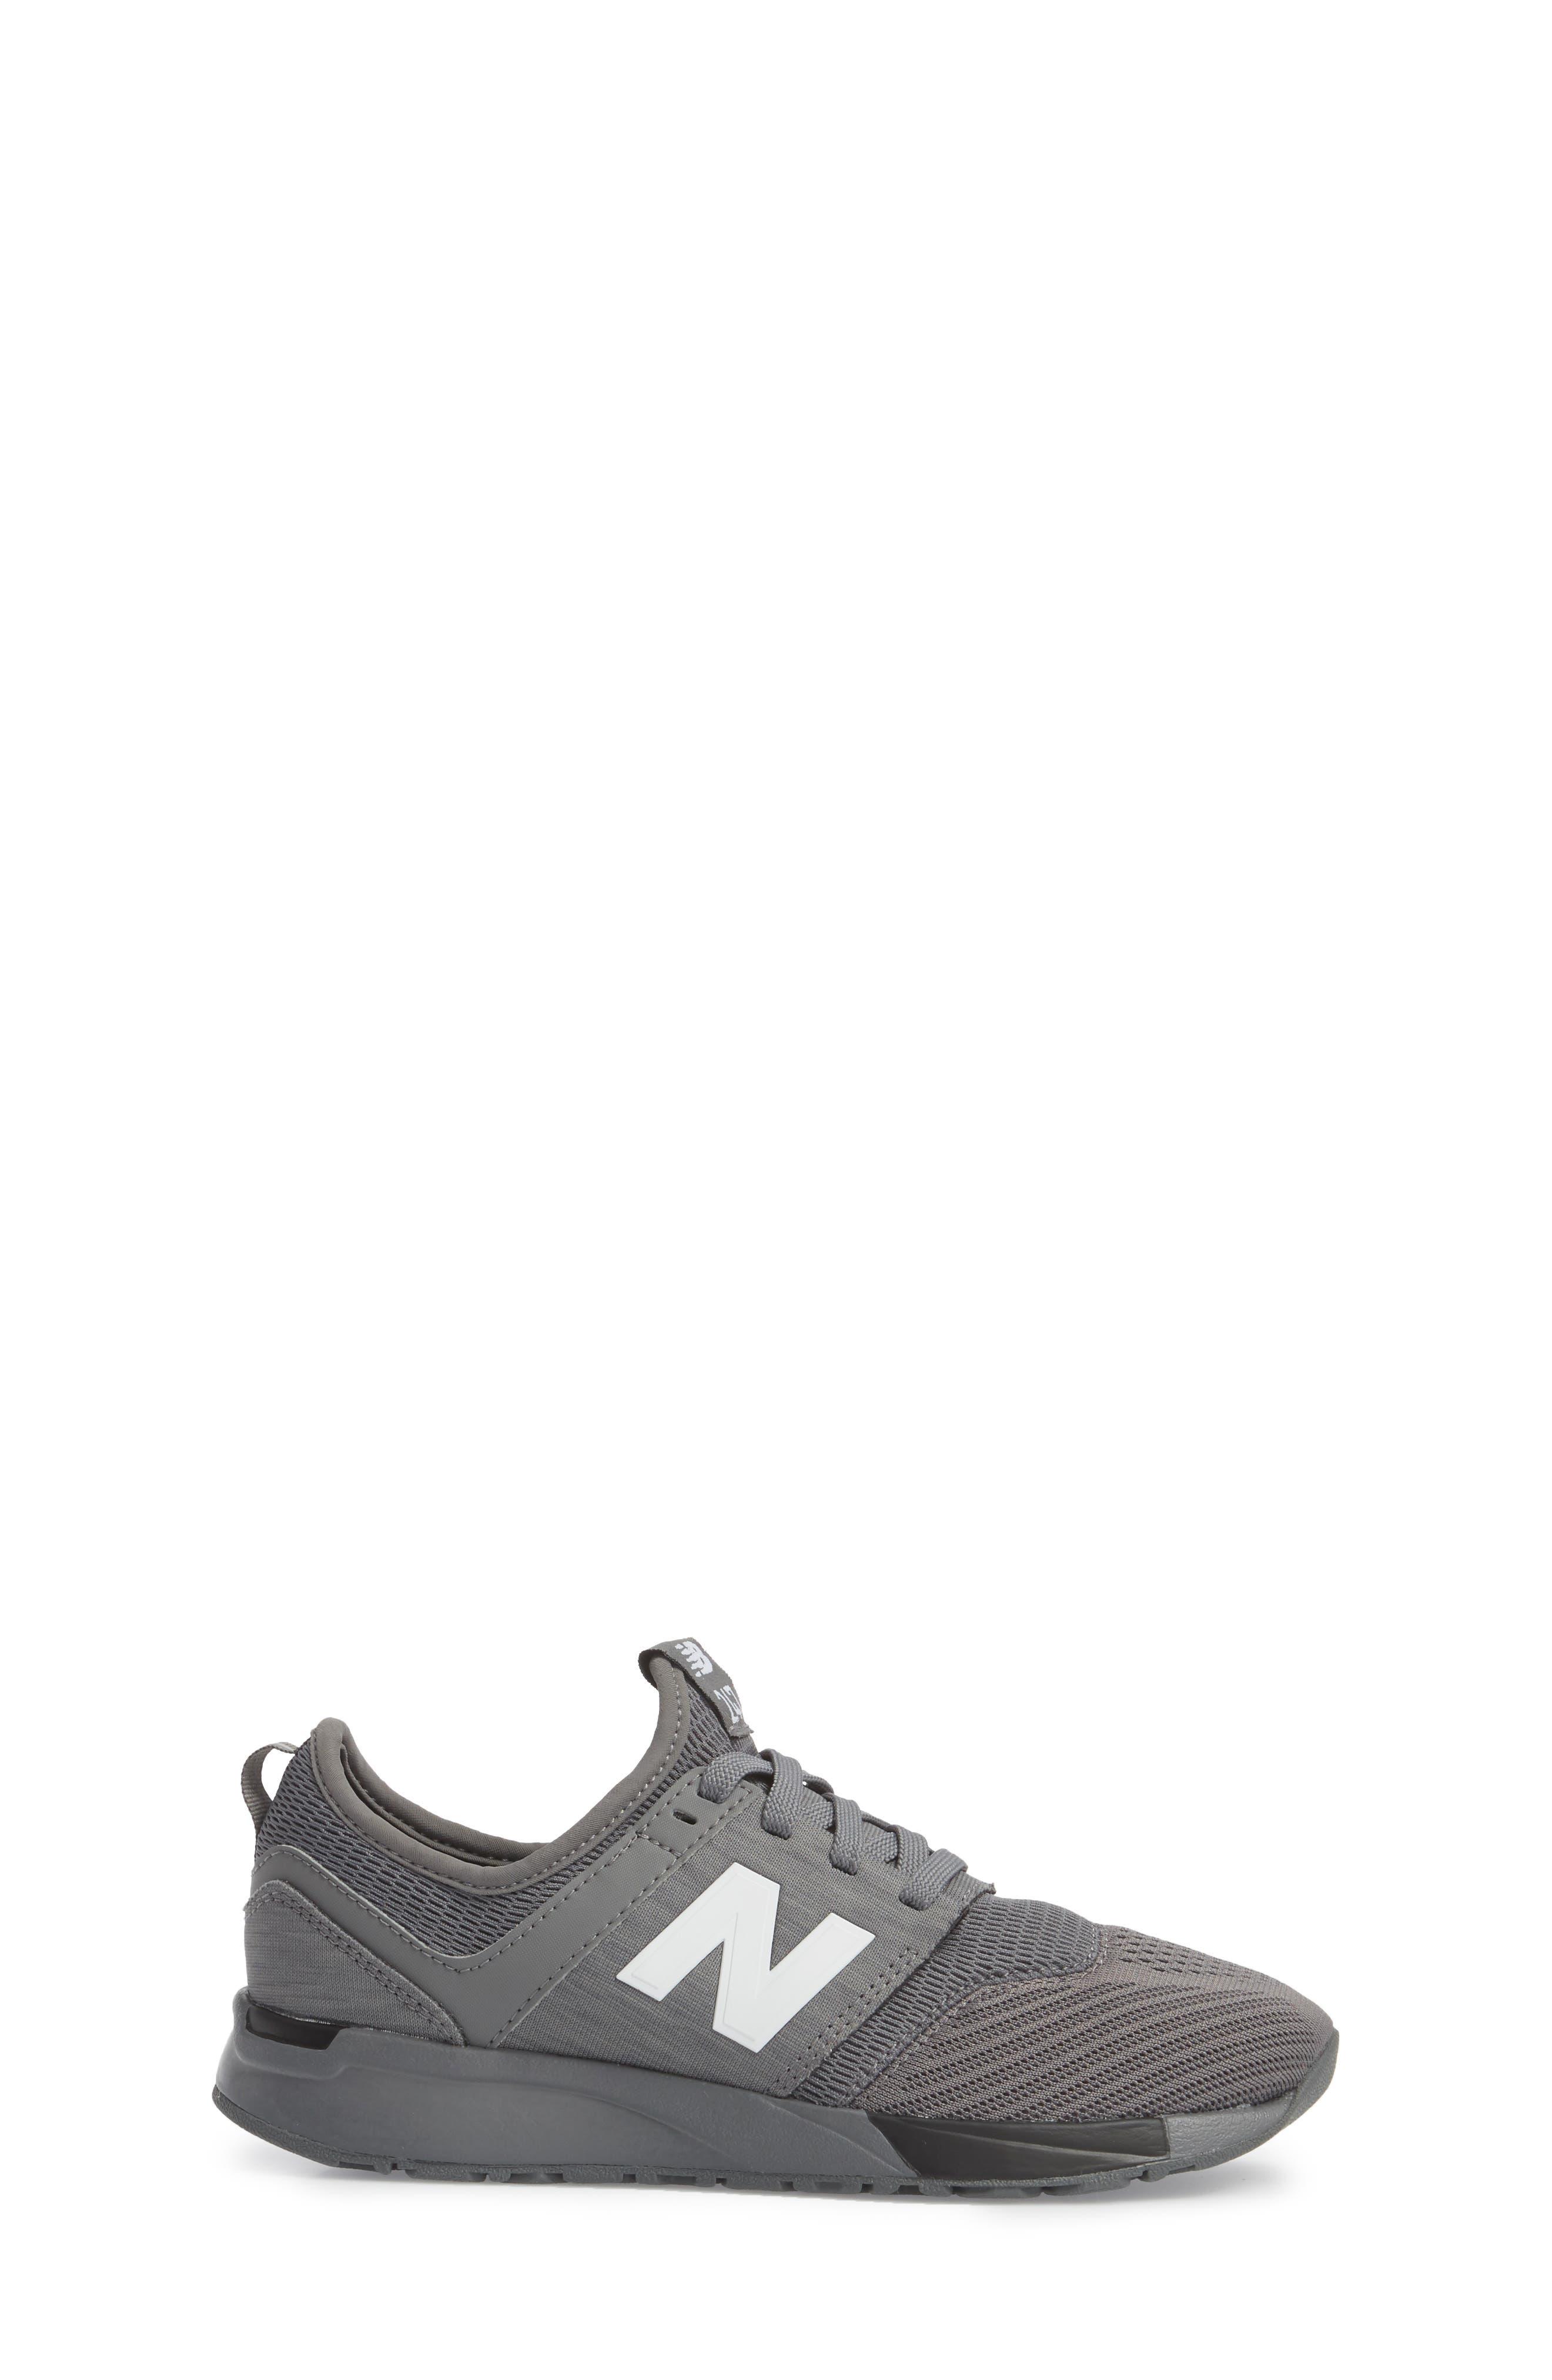 247 Sport Sneaker,                             Alternate thumbnail 3, color,                             Grey/ Black